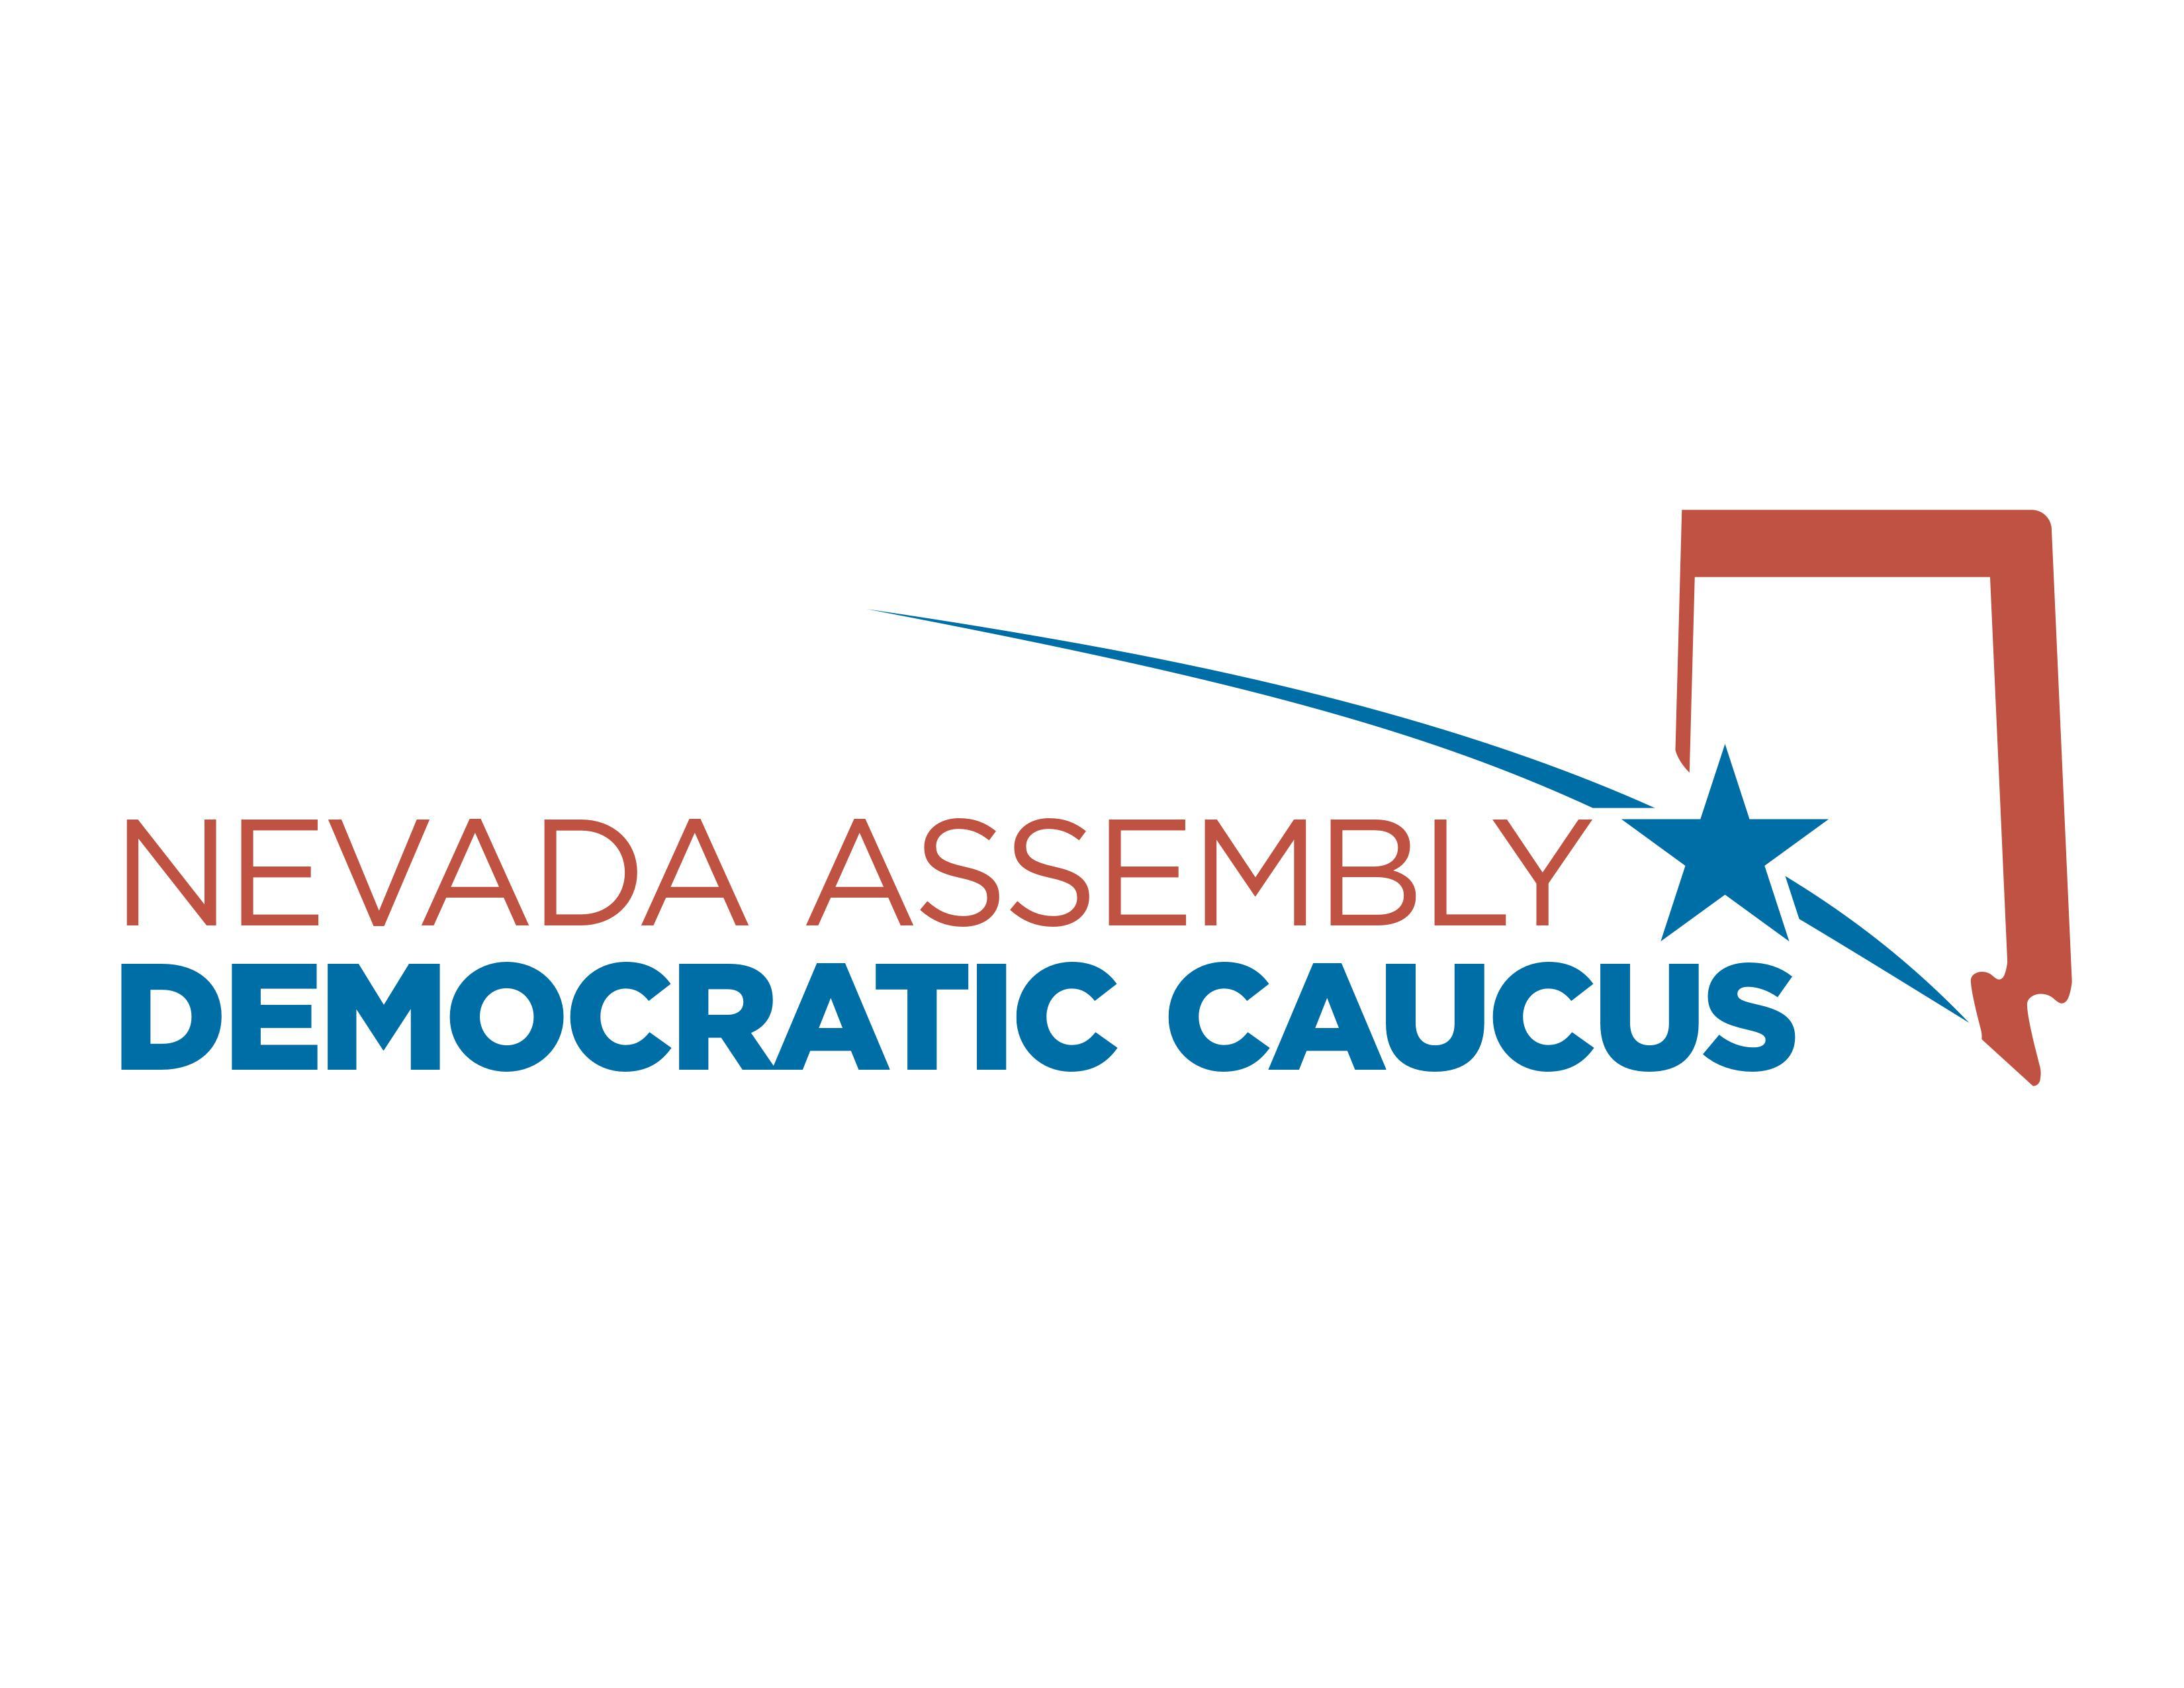 Nevada Assembly Democratic Caucus